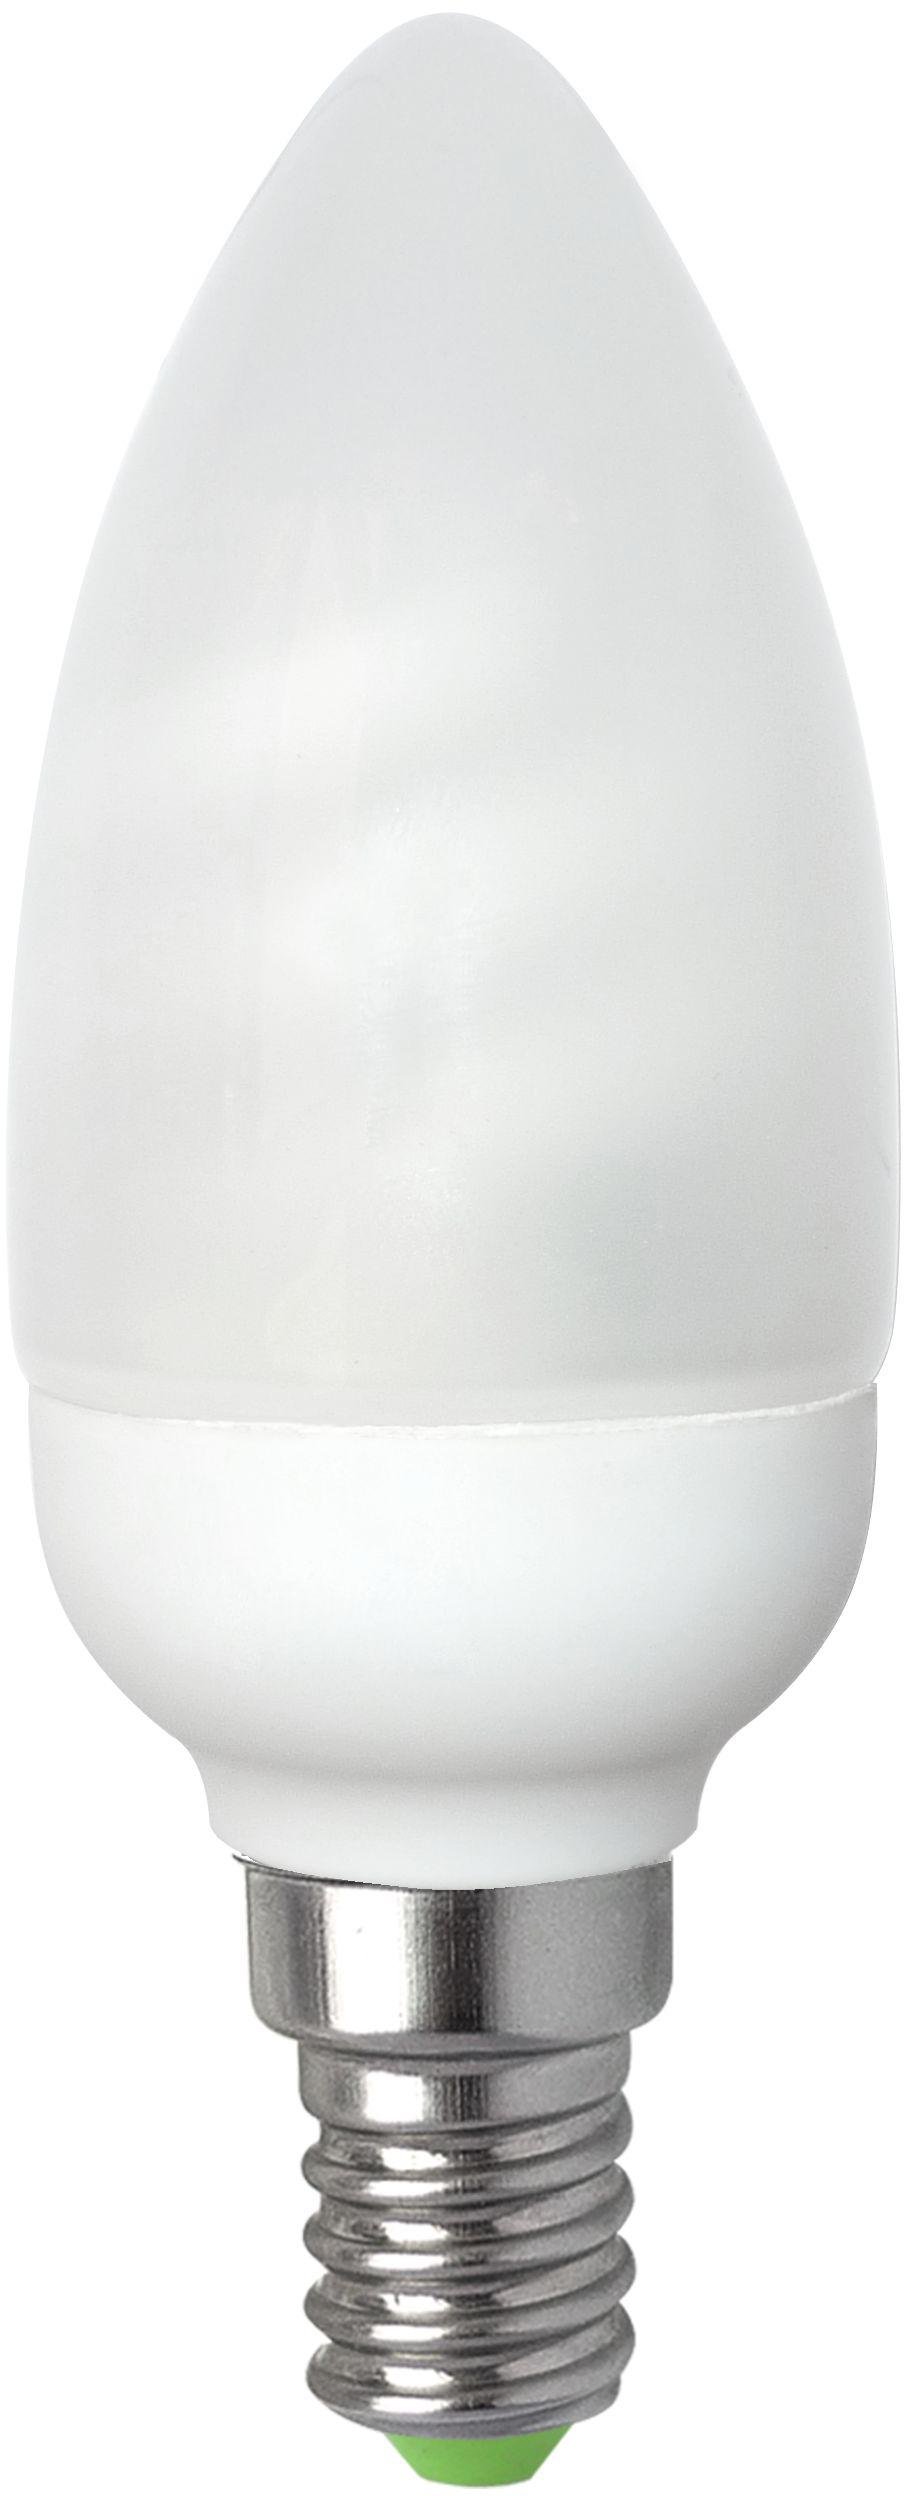 RETLUX RFL 21 žárovka candle C37 9W E14